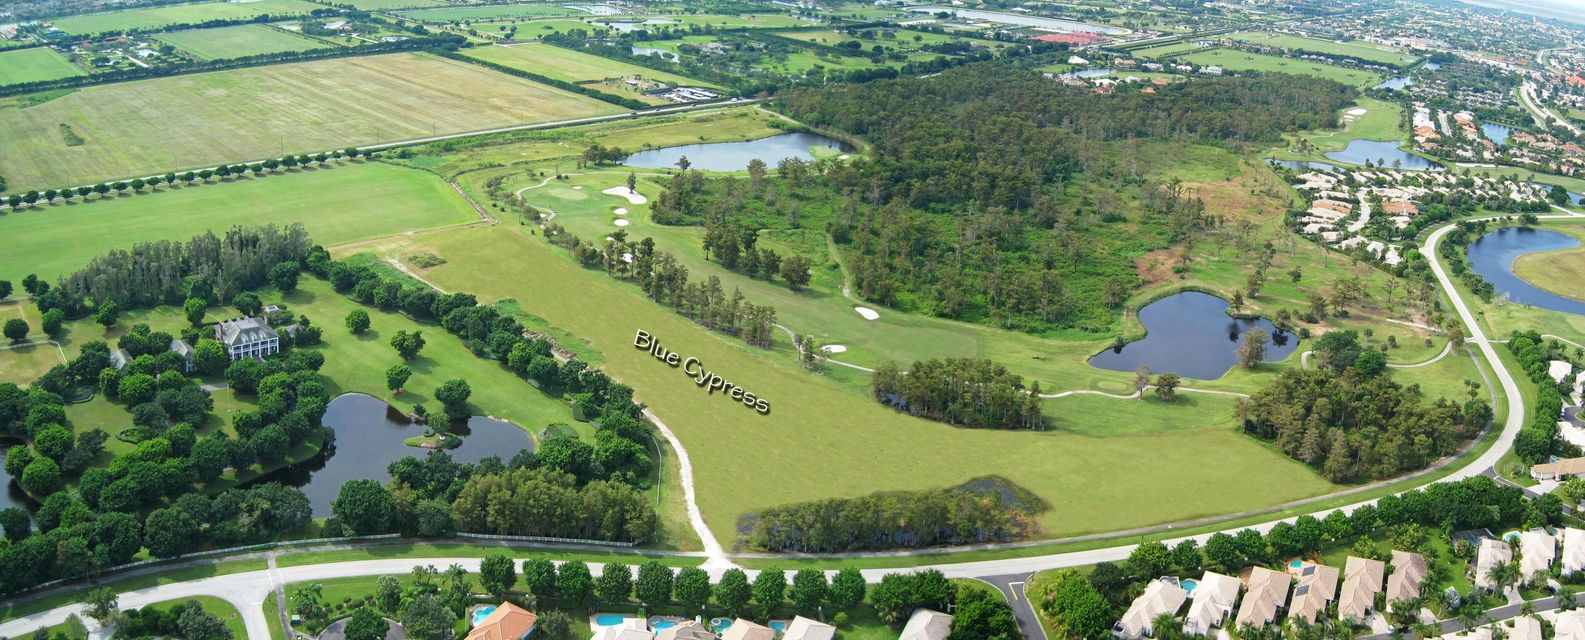 Single Family Home for Sale at 3109 Blue Cypress Lane 3109 Blue Cypress Lane Wellington, Florida 33414 United States